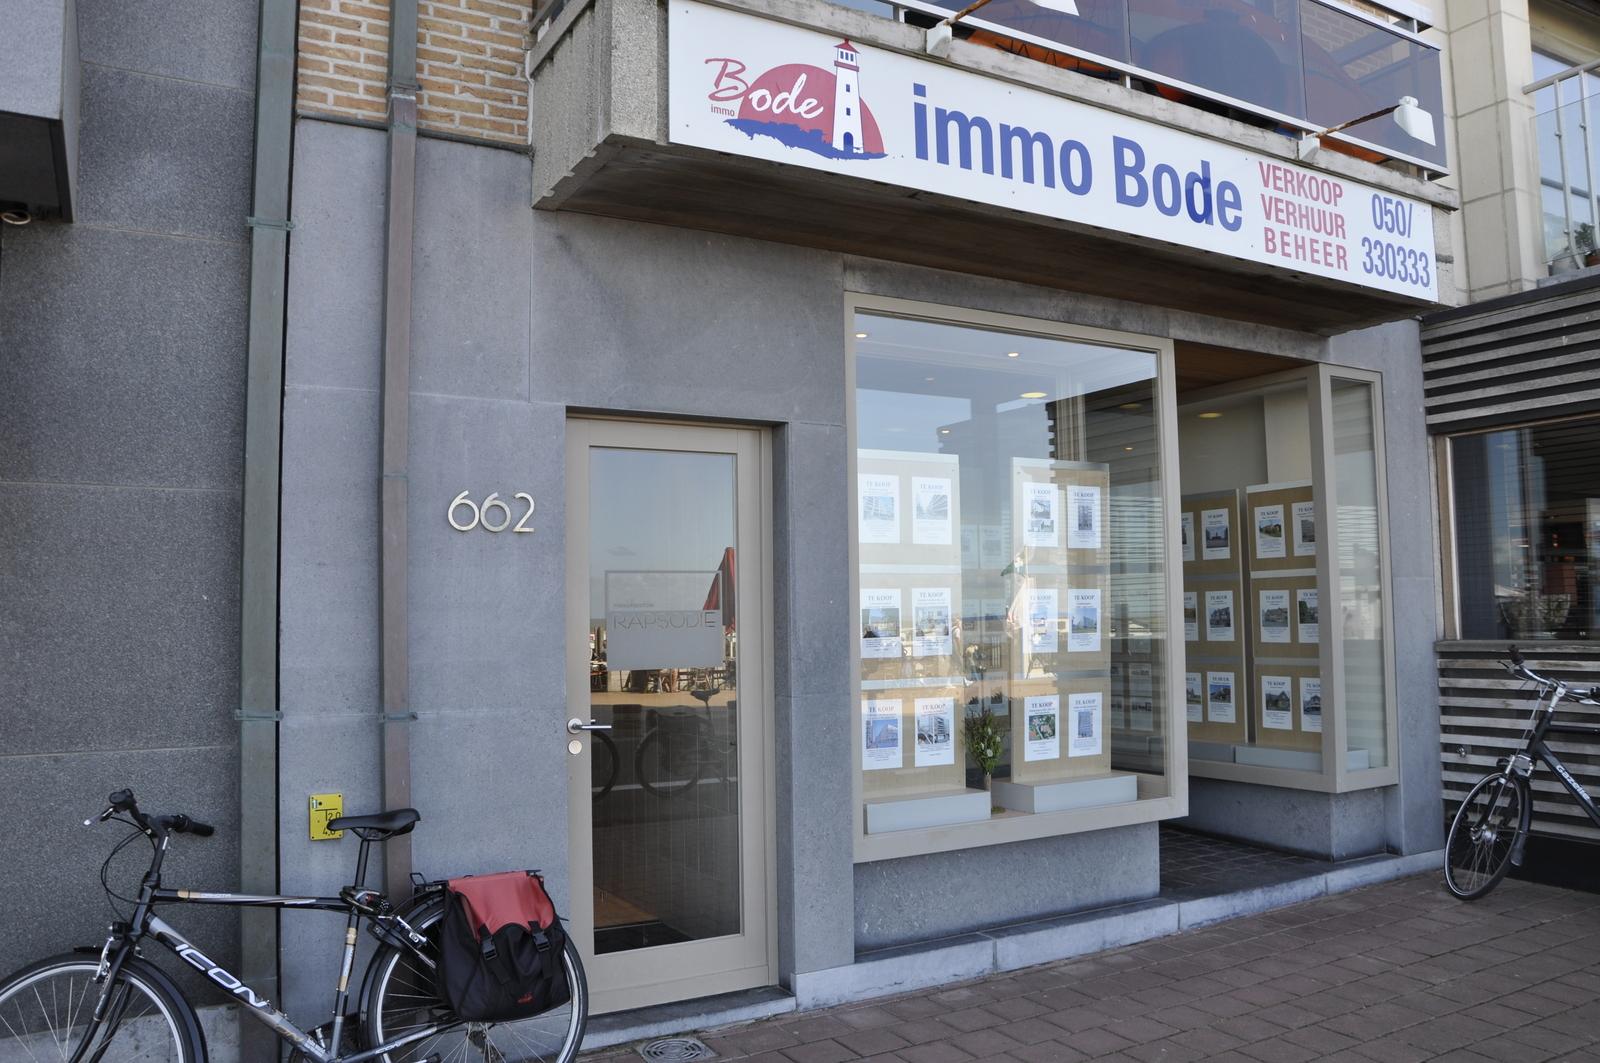 Immo Bode | Toerisme Knokke-Heist